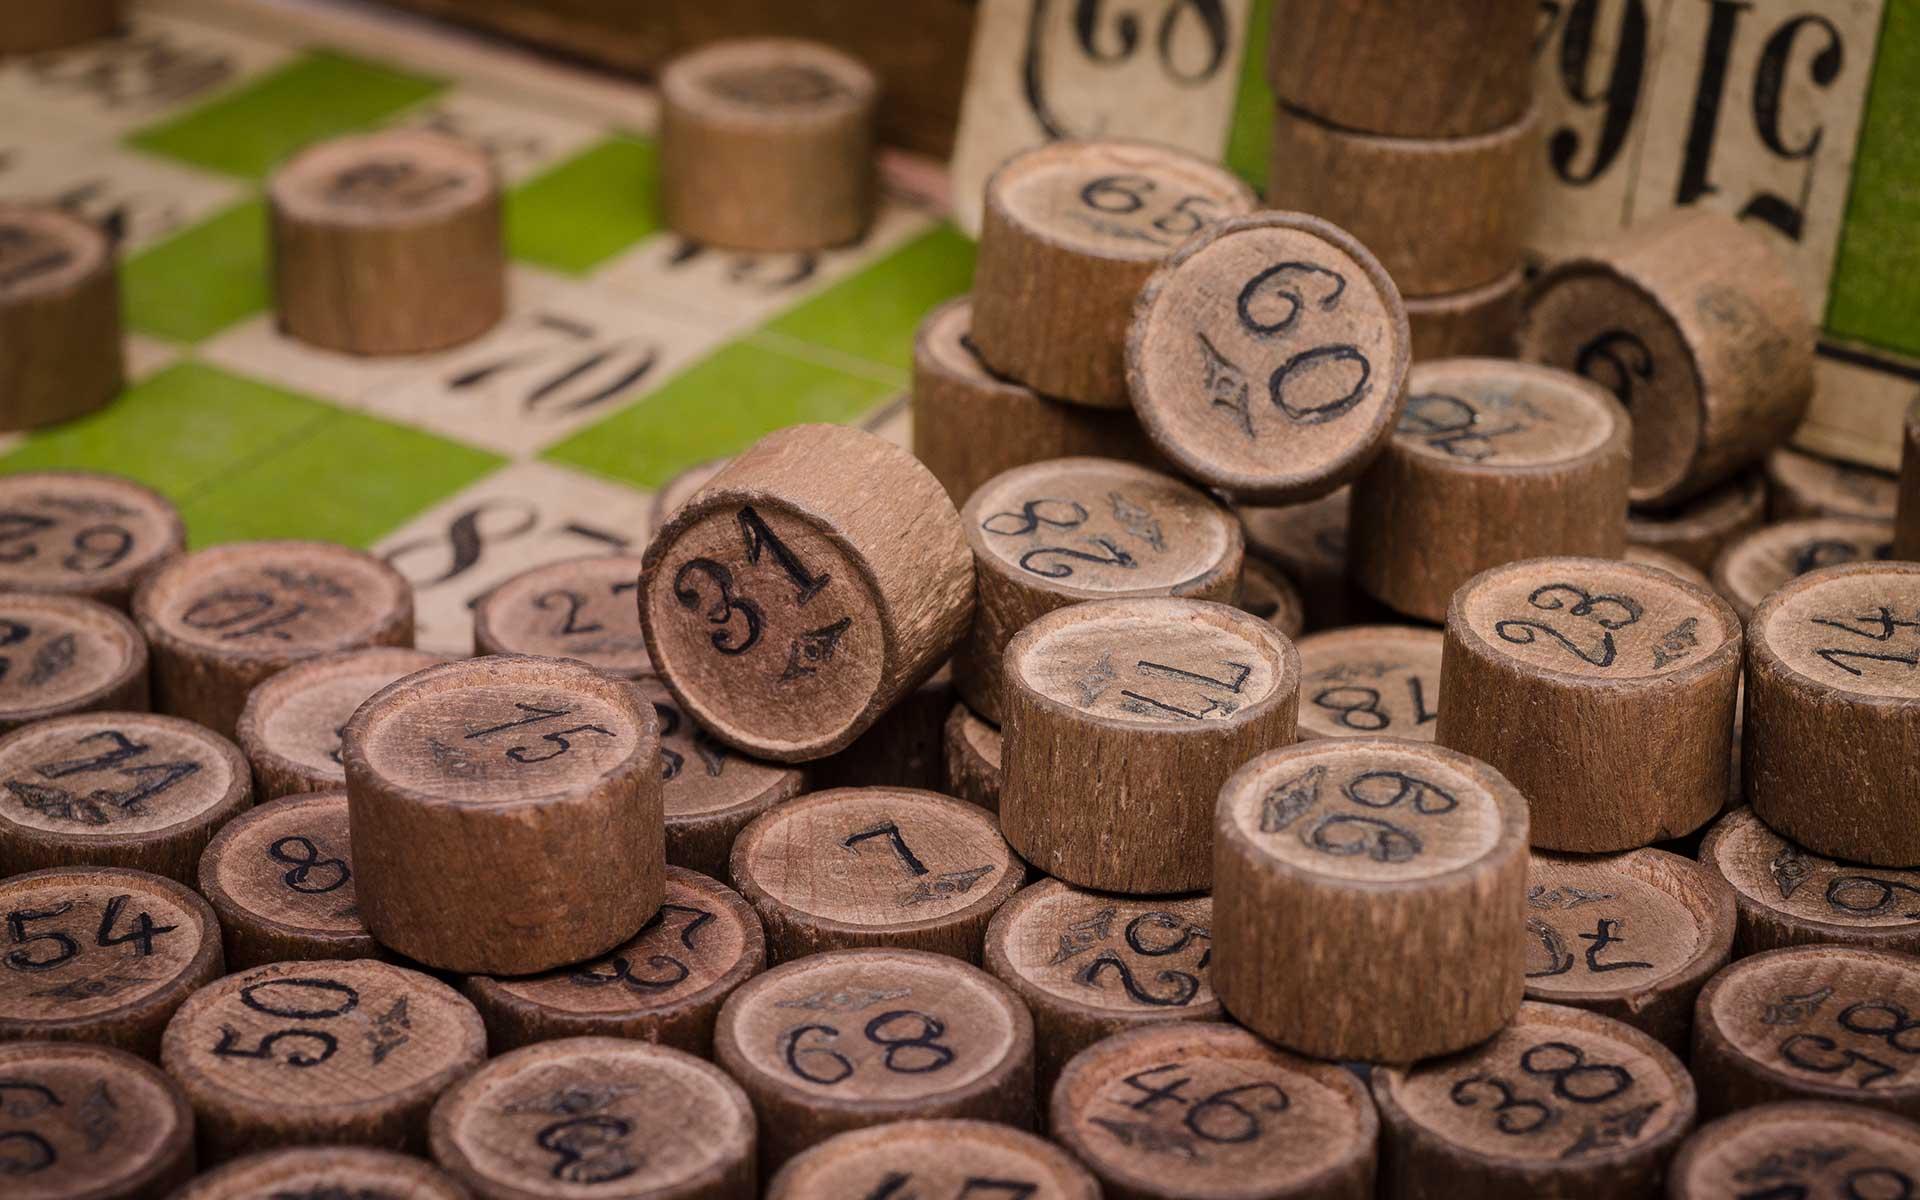 Organisation bingo